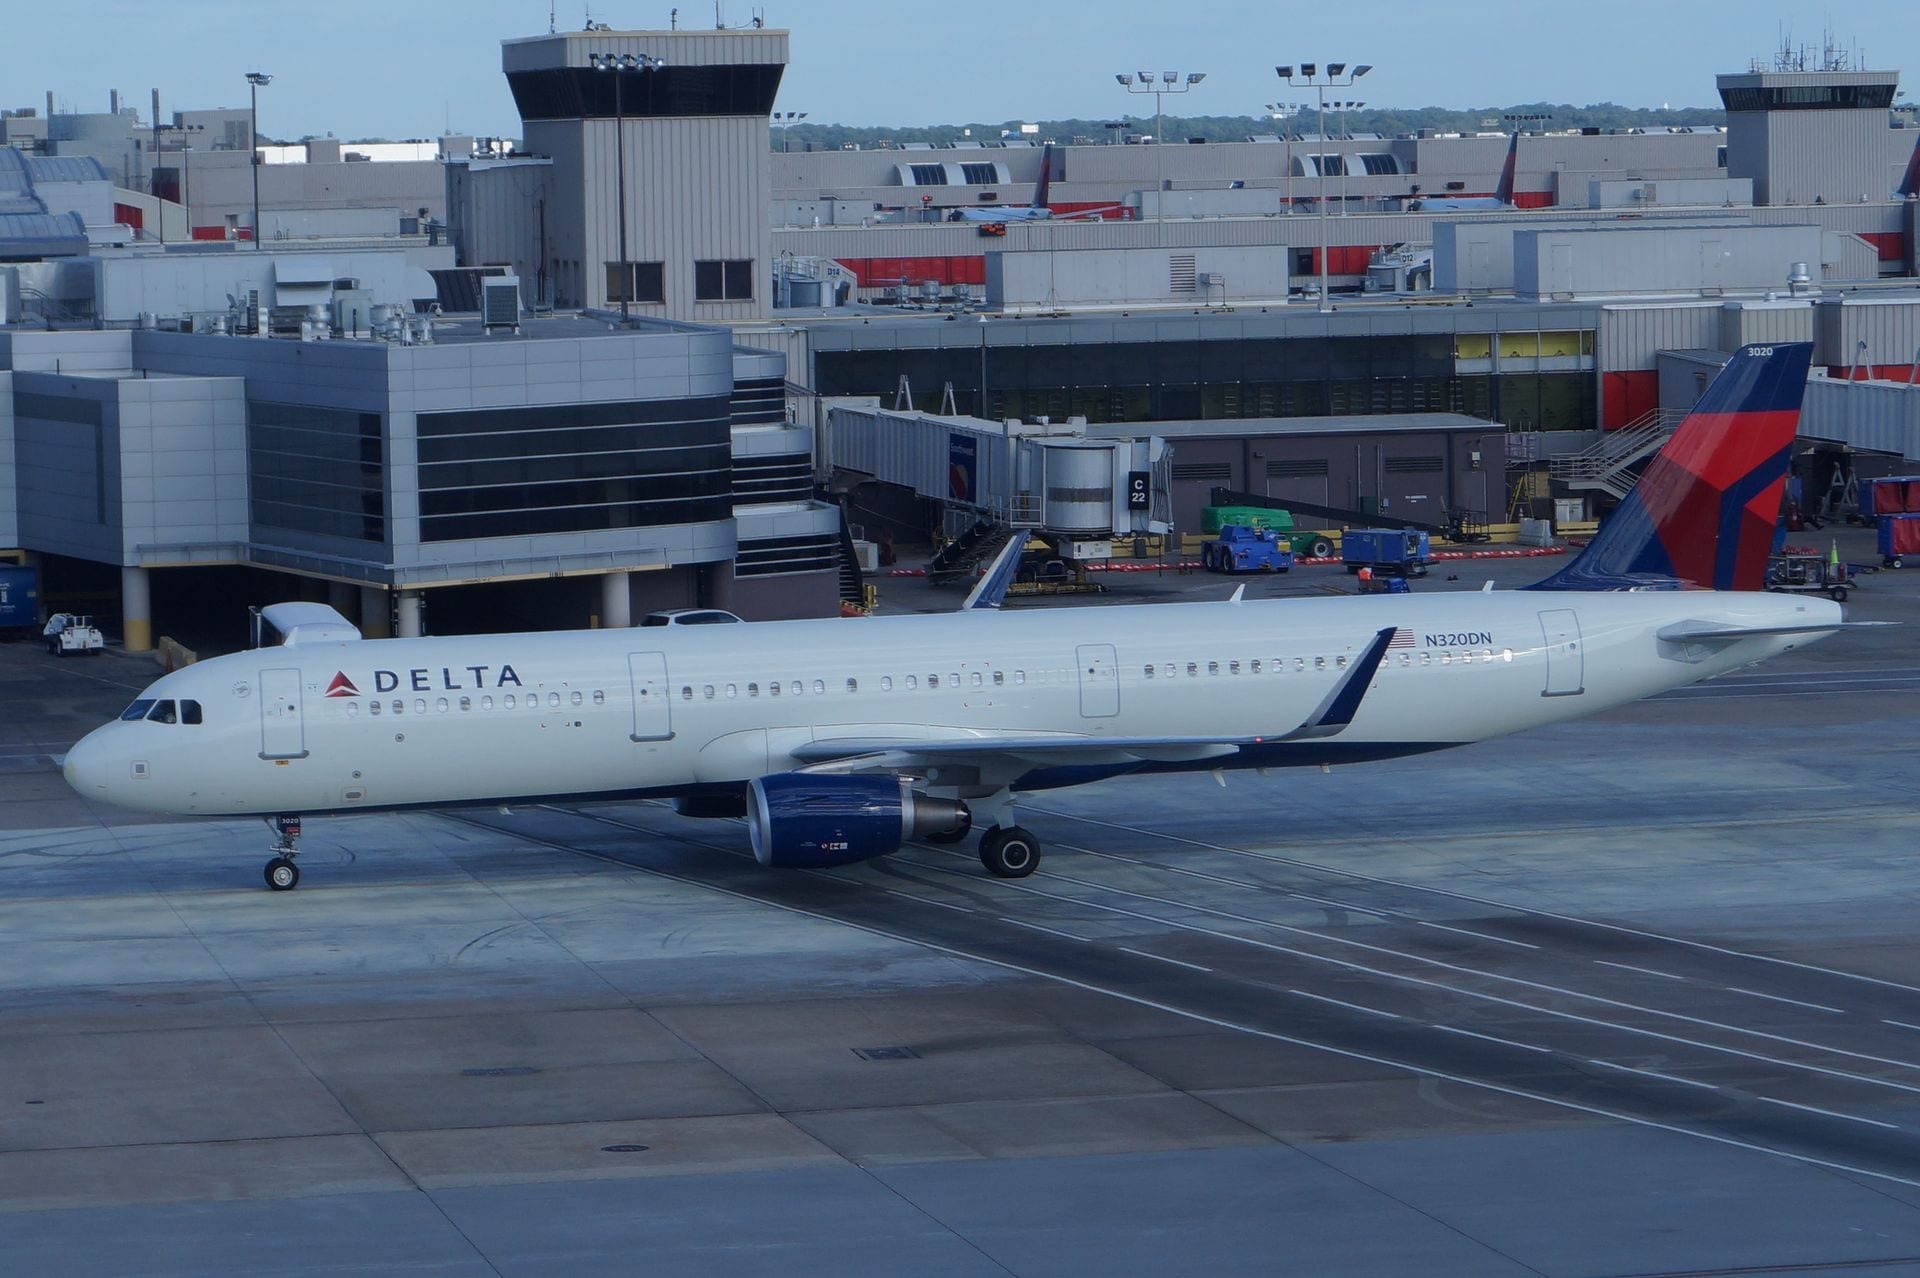 Review: Delta Comfort Plus Kurzstrecke - unser Erfahrungsbericht